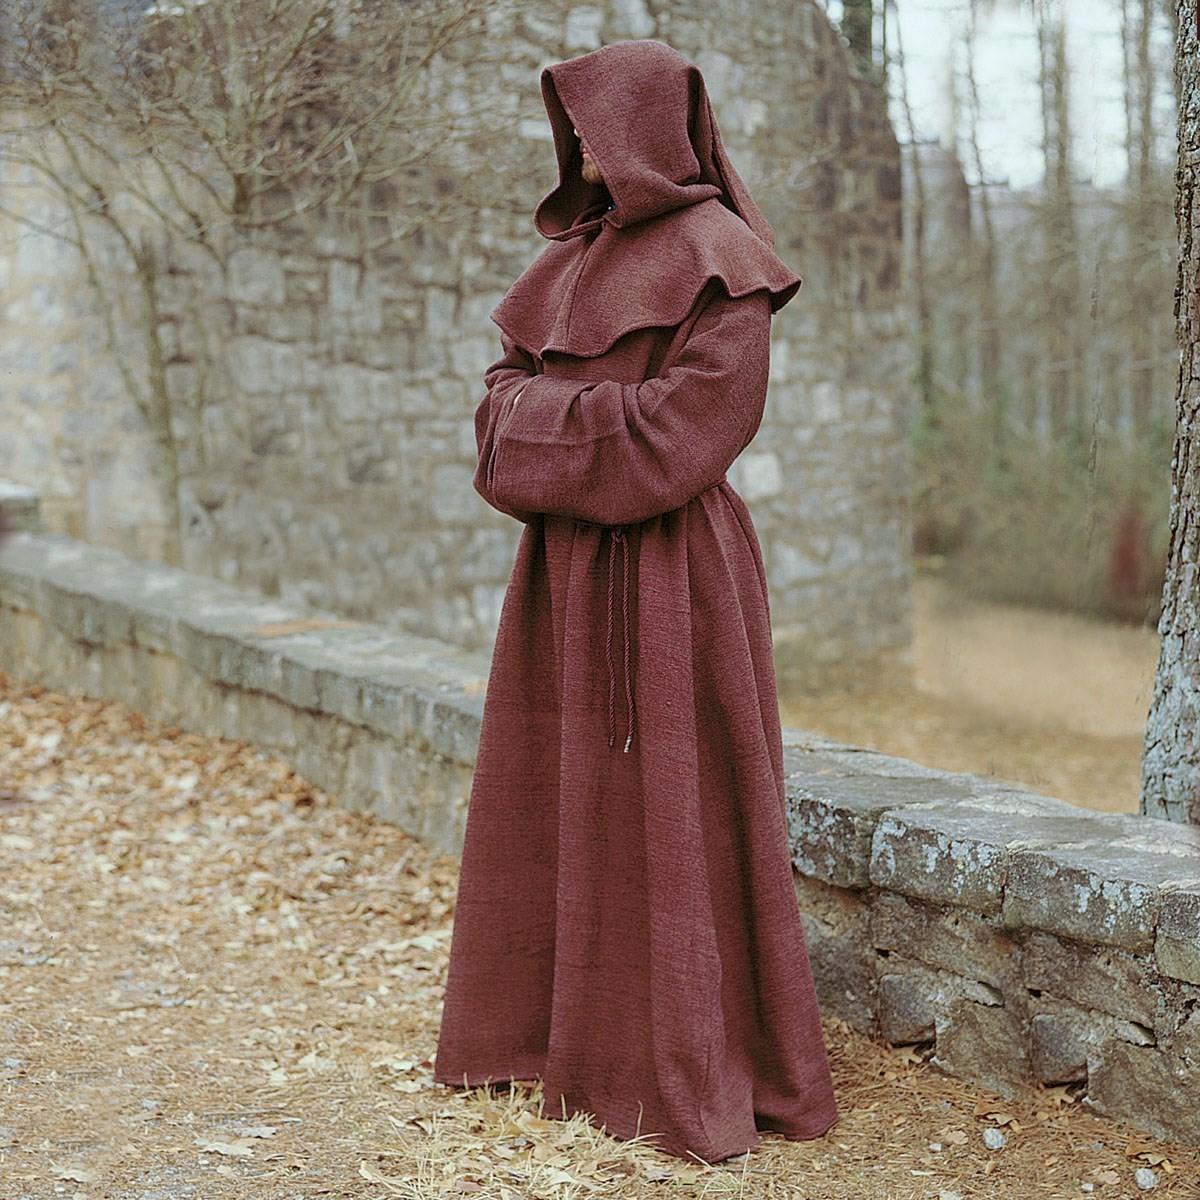 Medieval Monk's Robe and Hood - Brown